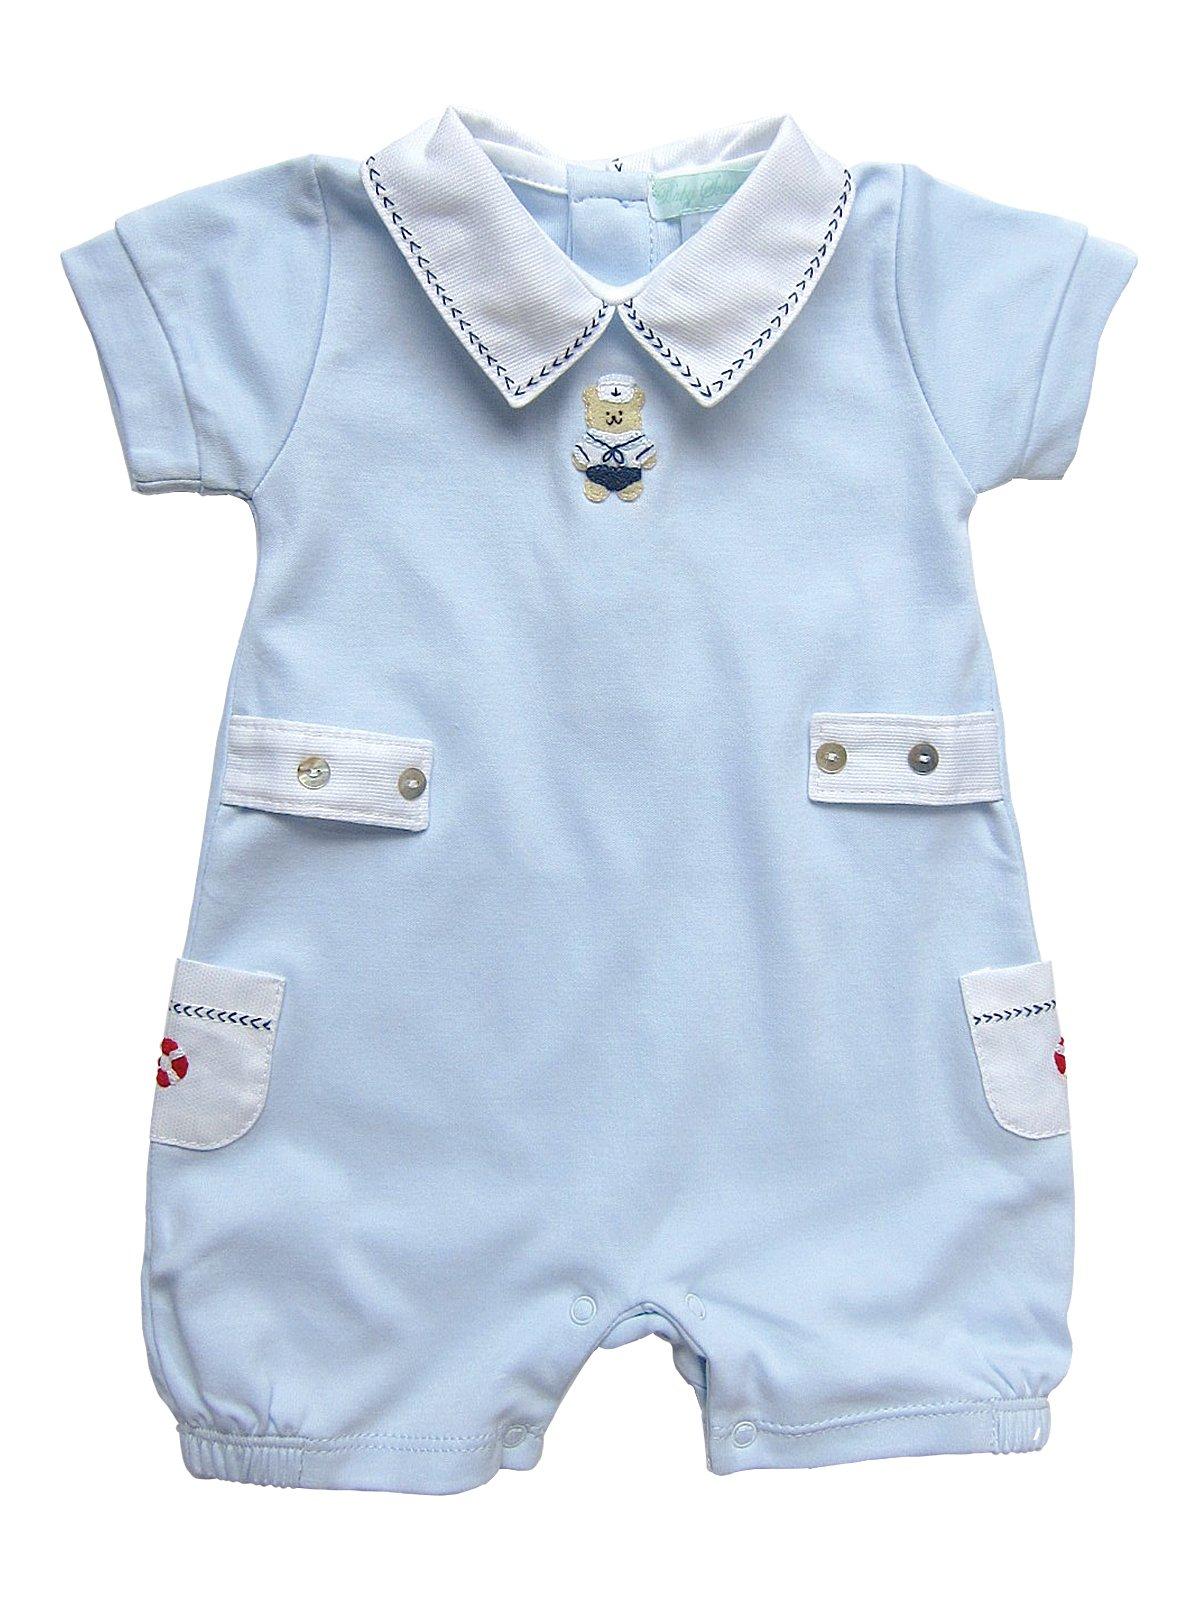 Baby_Romper_2484.jpg